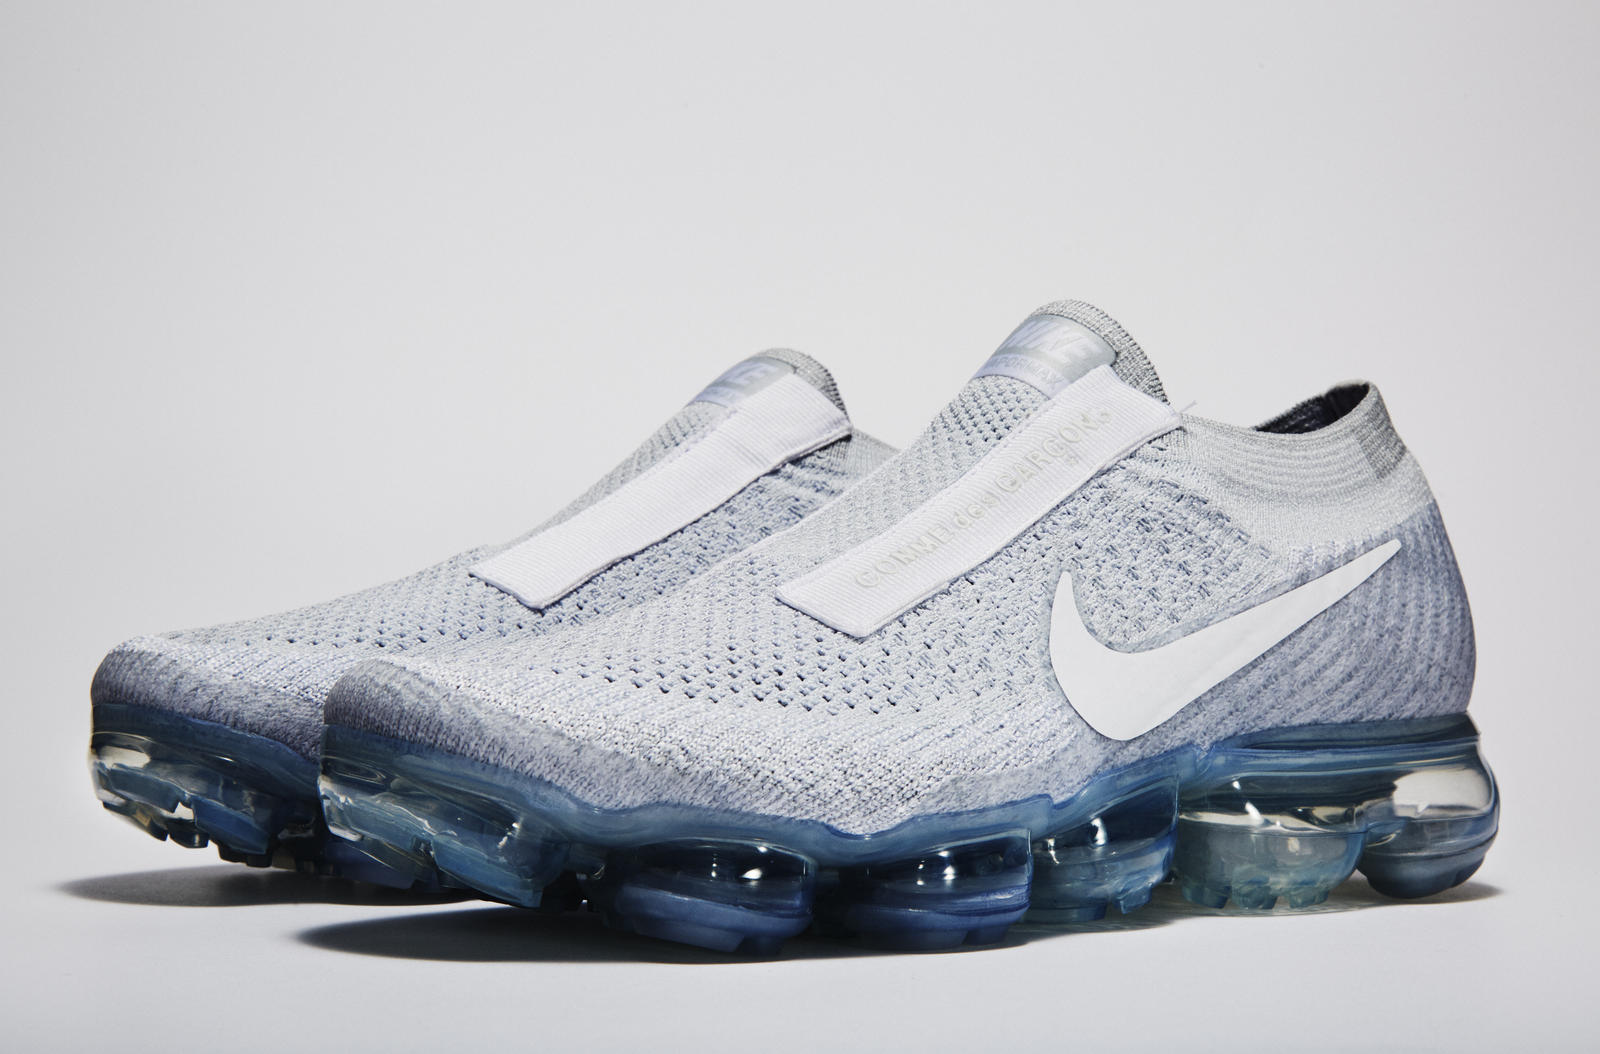 [Cheap Nike vapormax oreo] Cheap Nike AIR VAPORMAX FLYKNIT ASPHALT